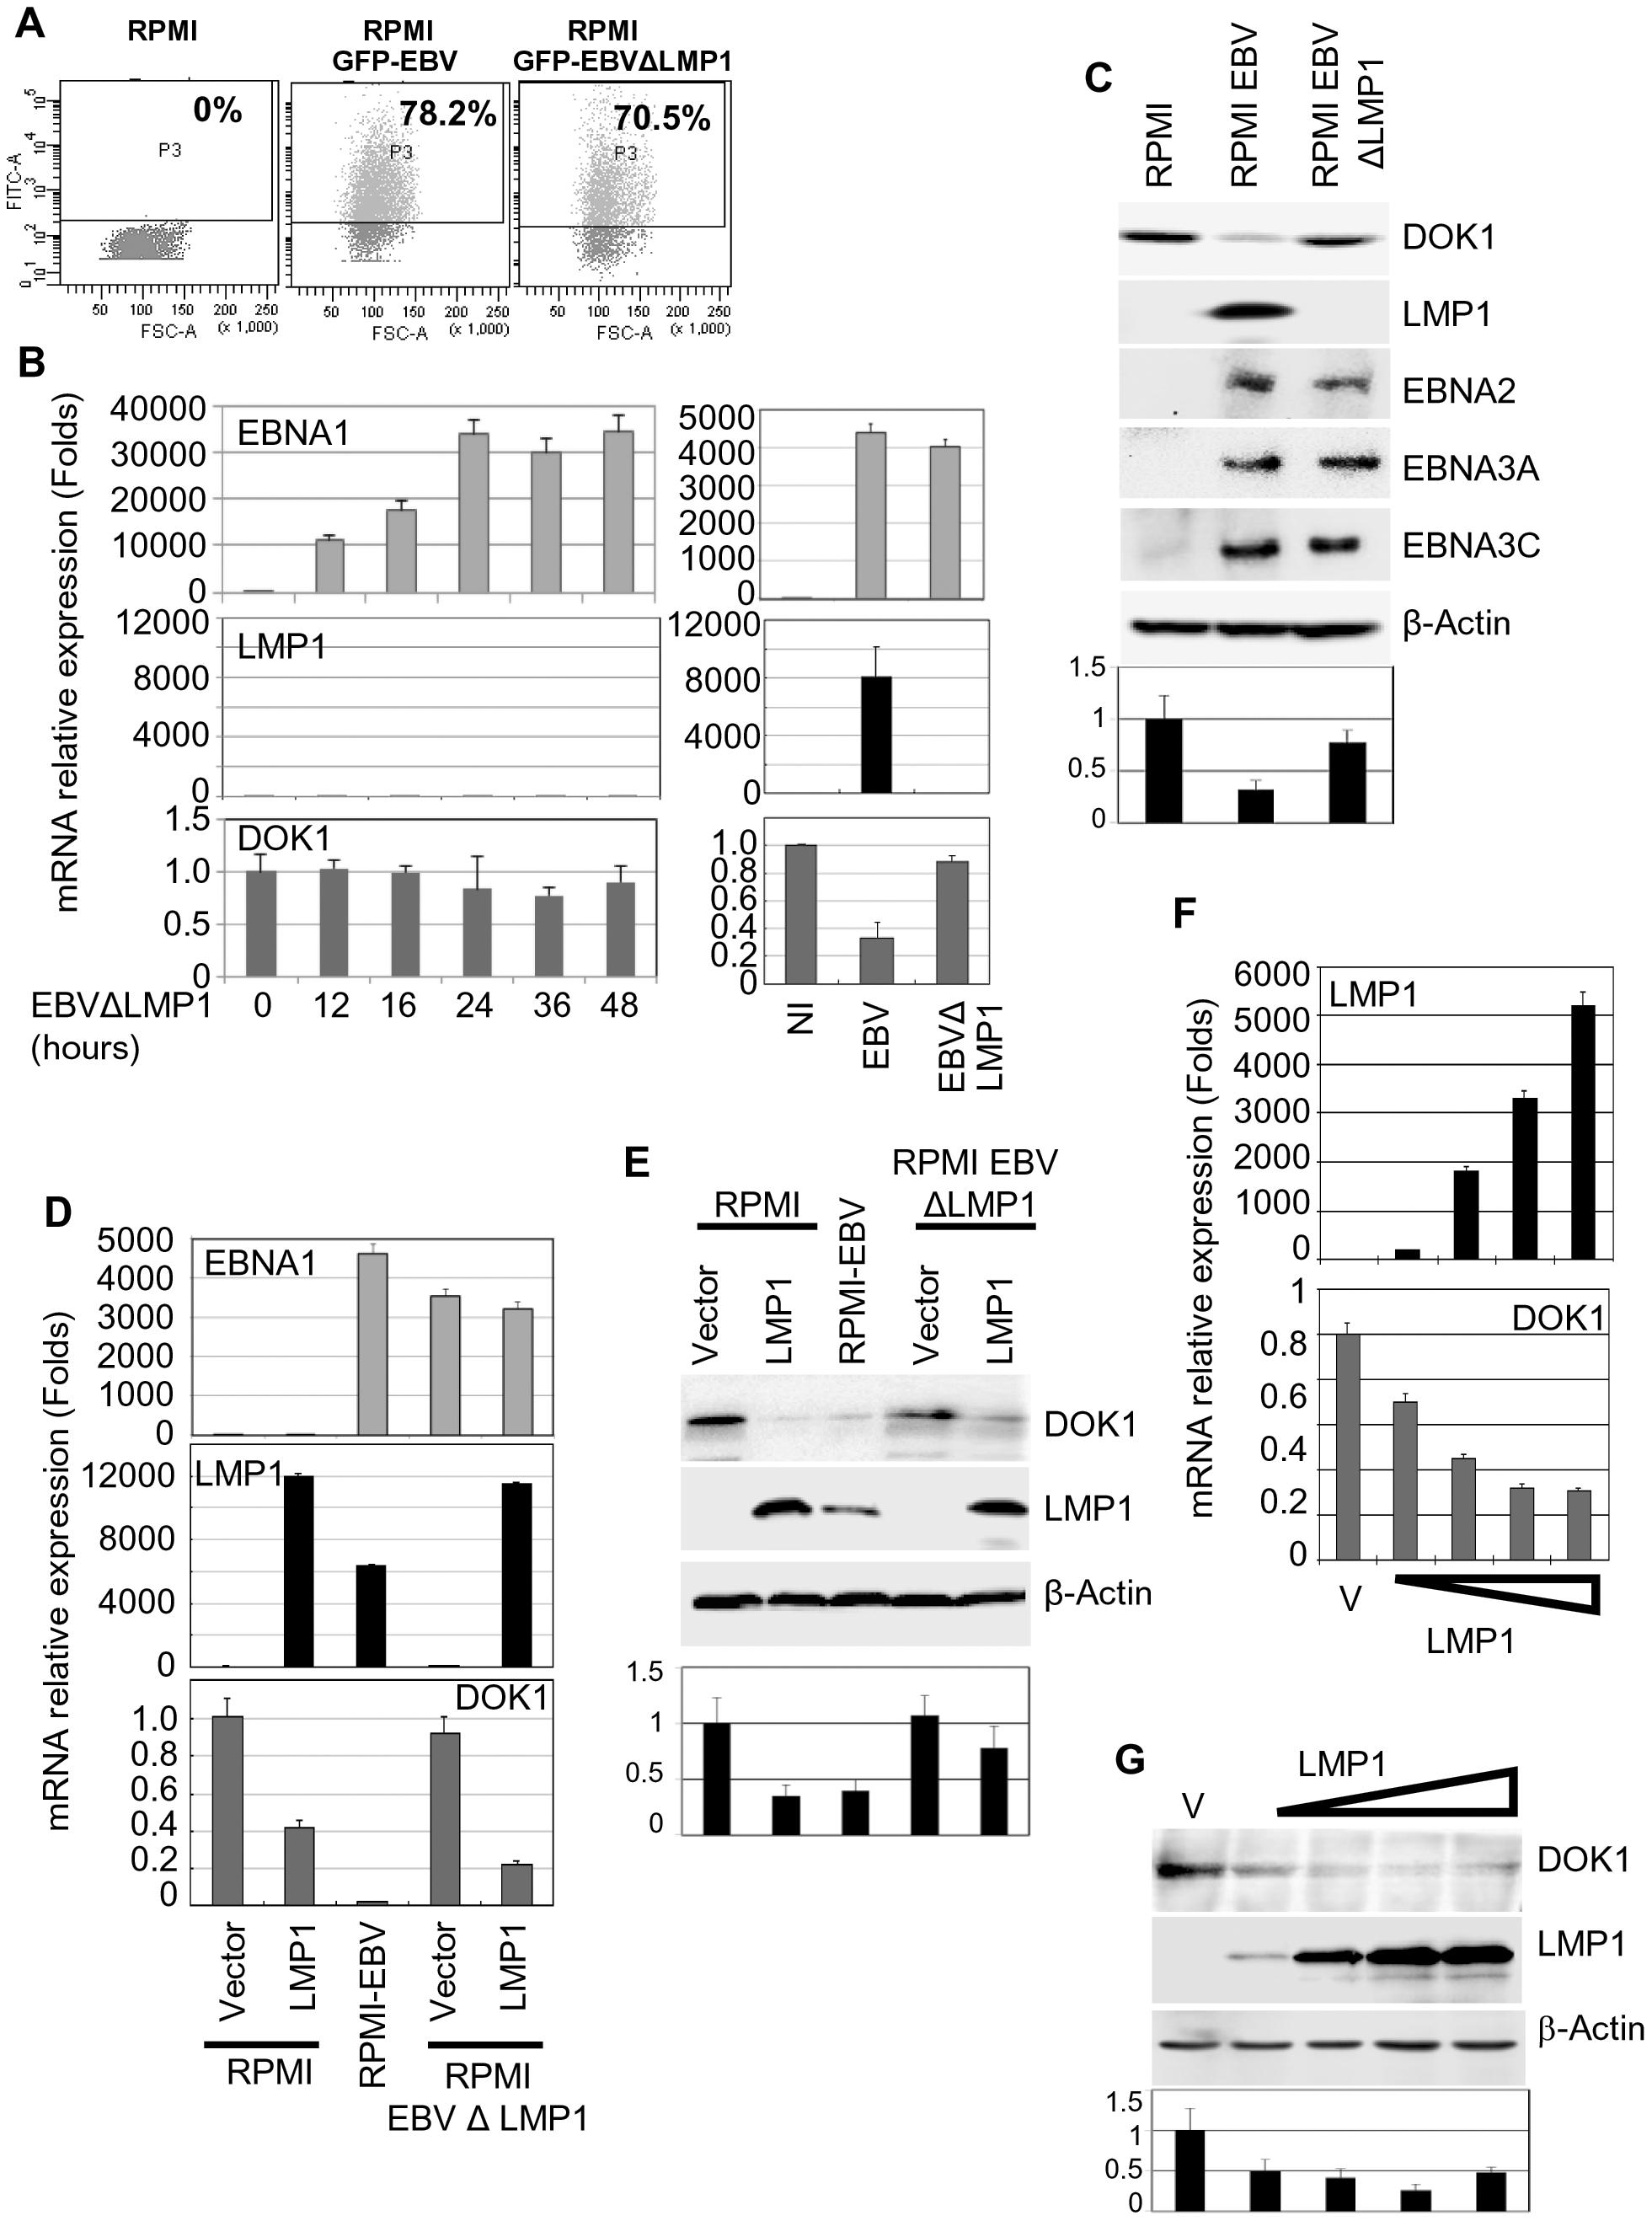 LMP1 plays a key role in EBV-mediated <i>DOK1</i> silencing.